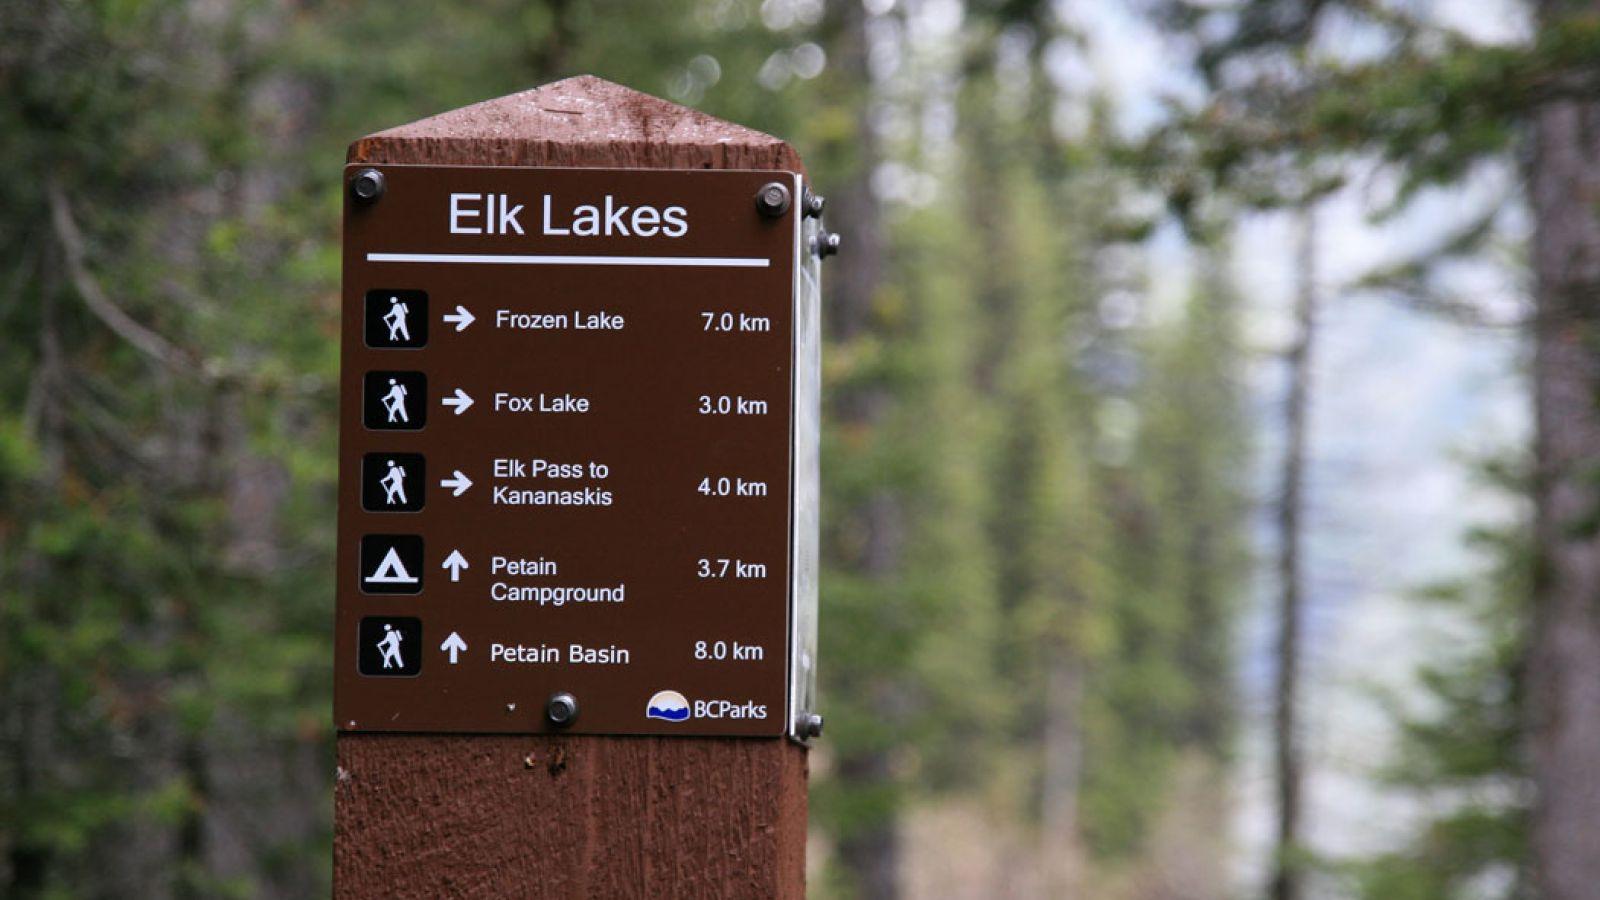 Elk Lakes Provincial Park signage.